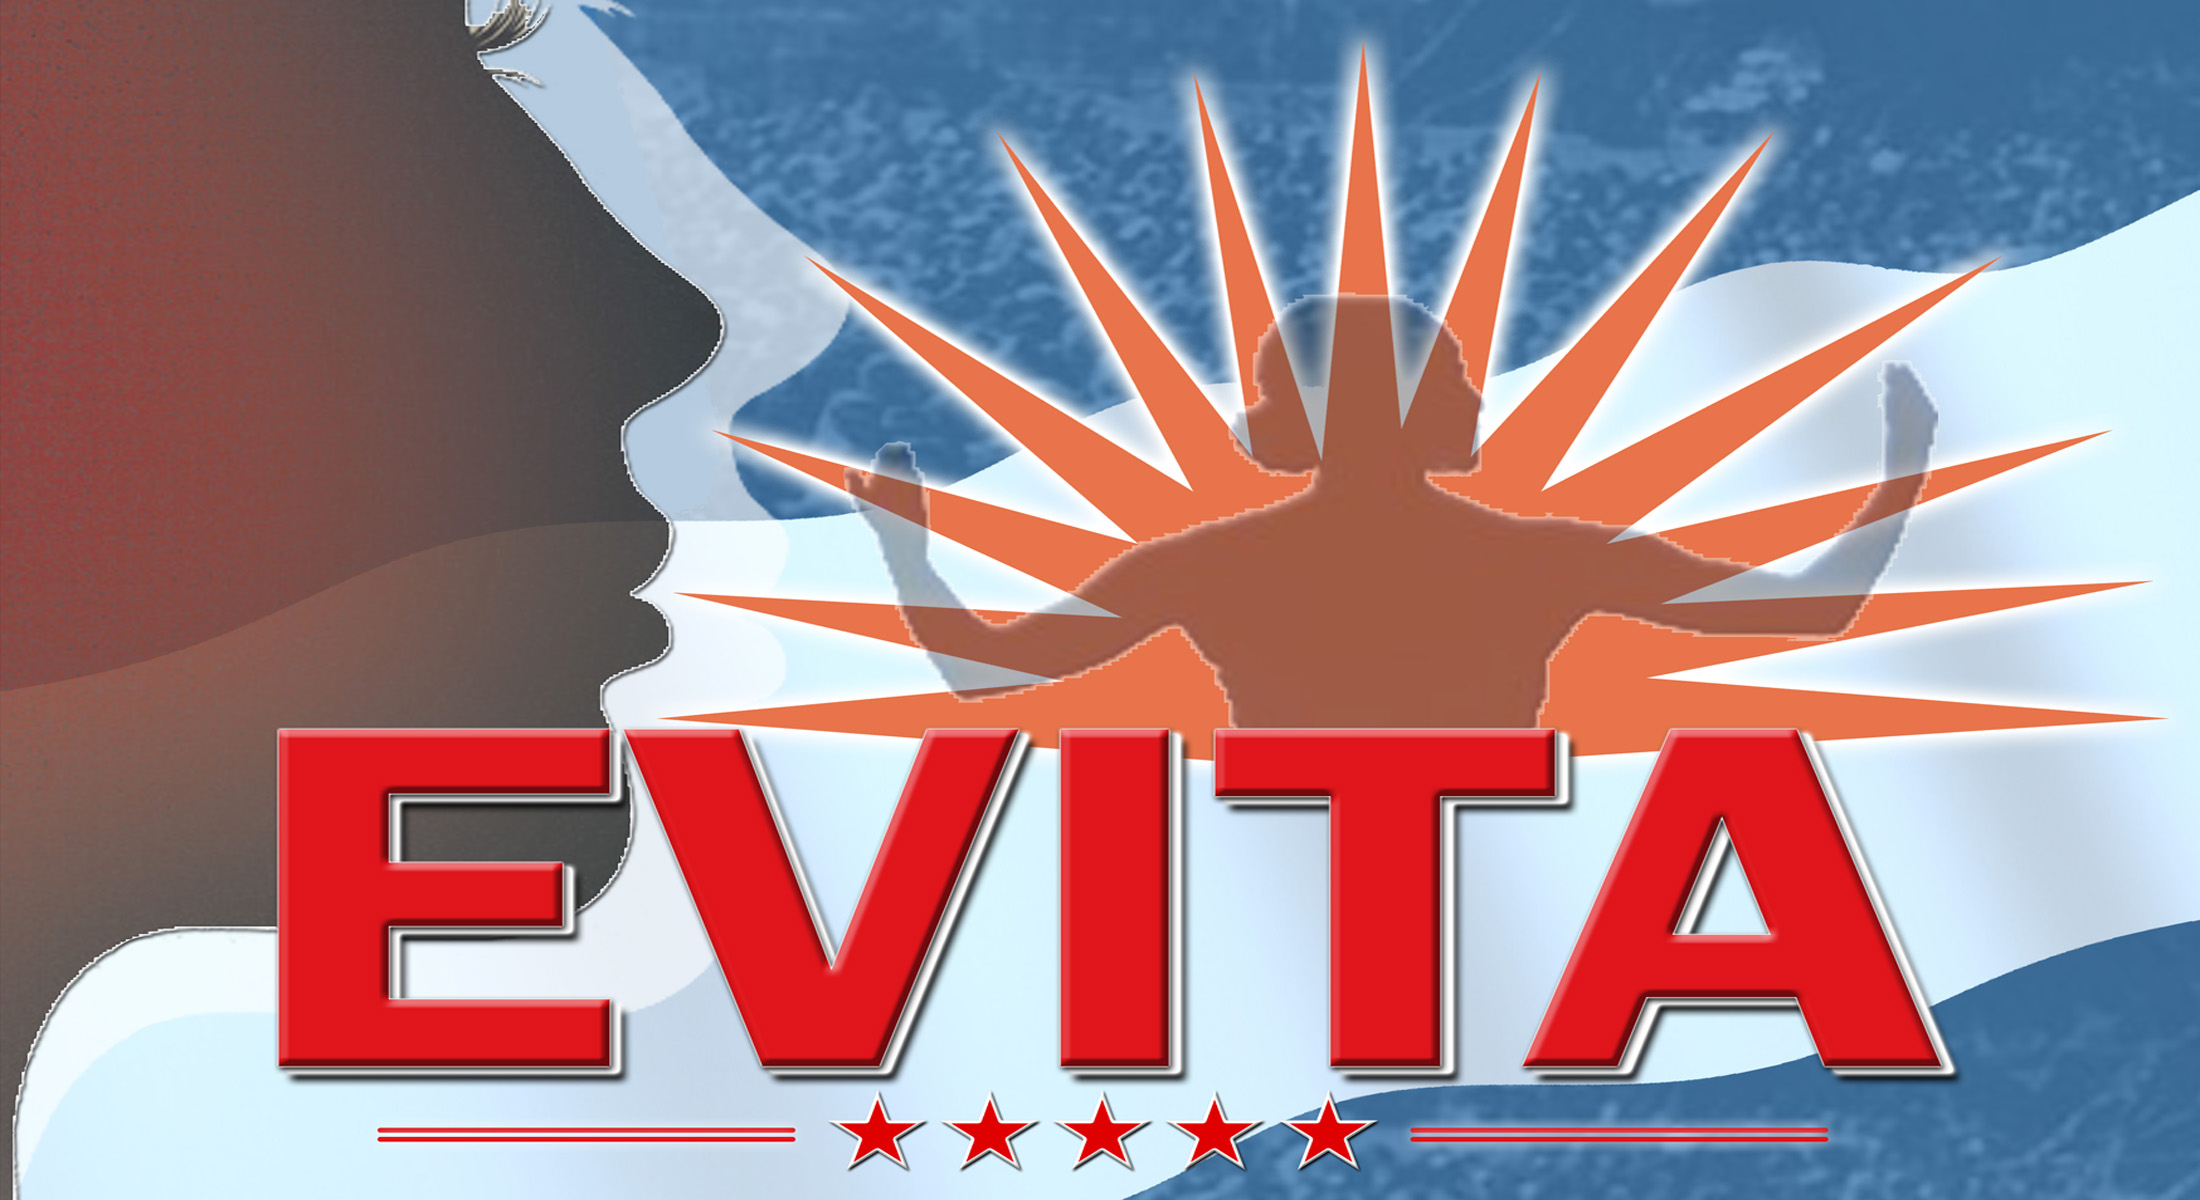 Evita banner image